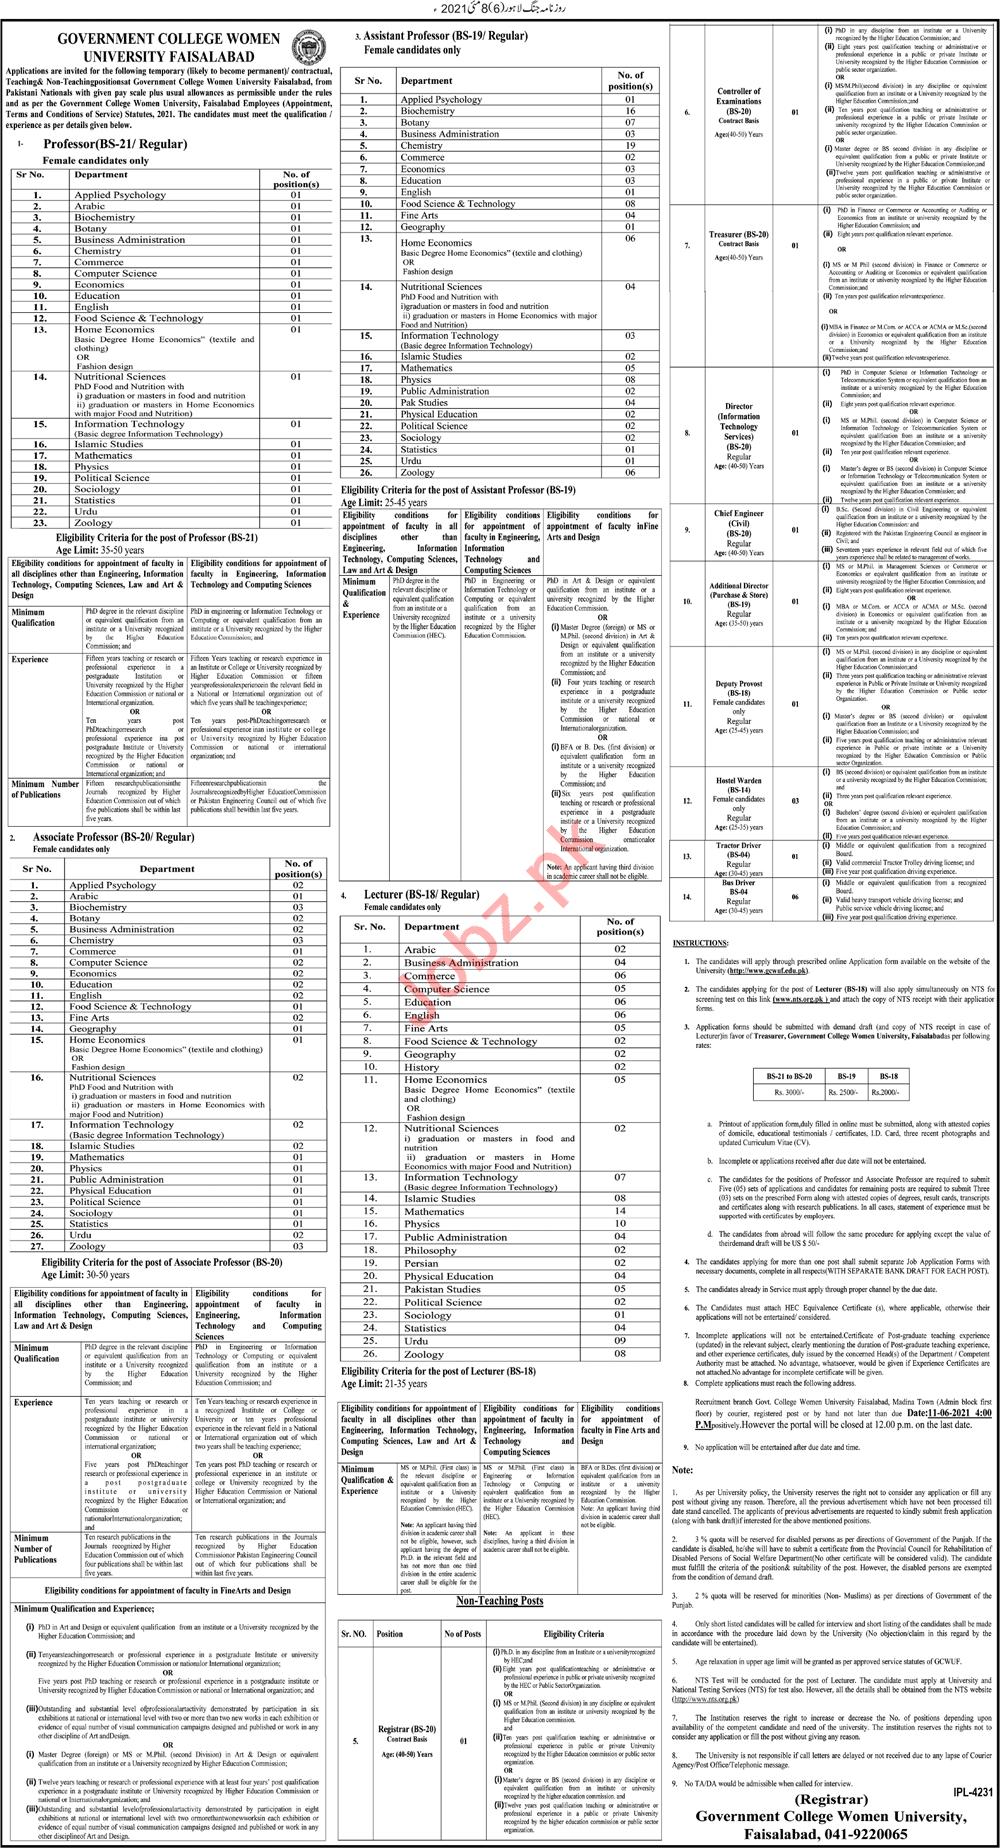 Govt College Women University Faisalabad GCWUF Jobs 2021